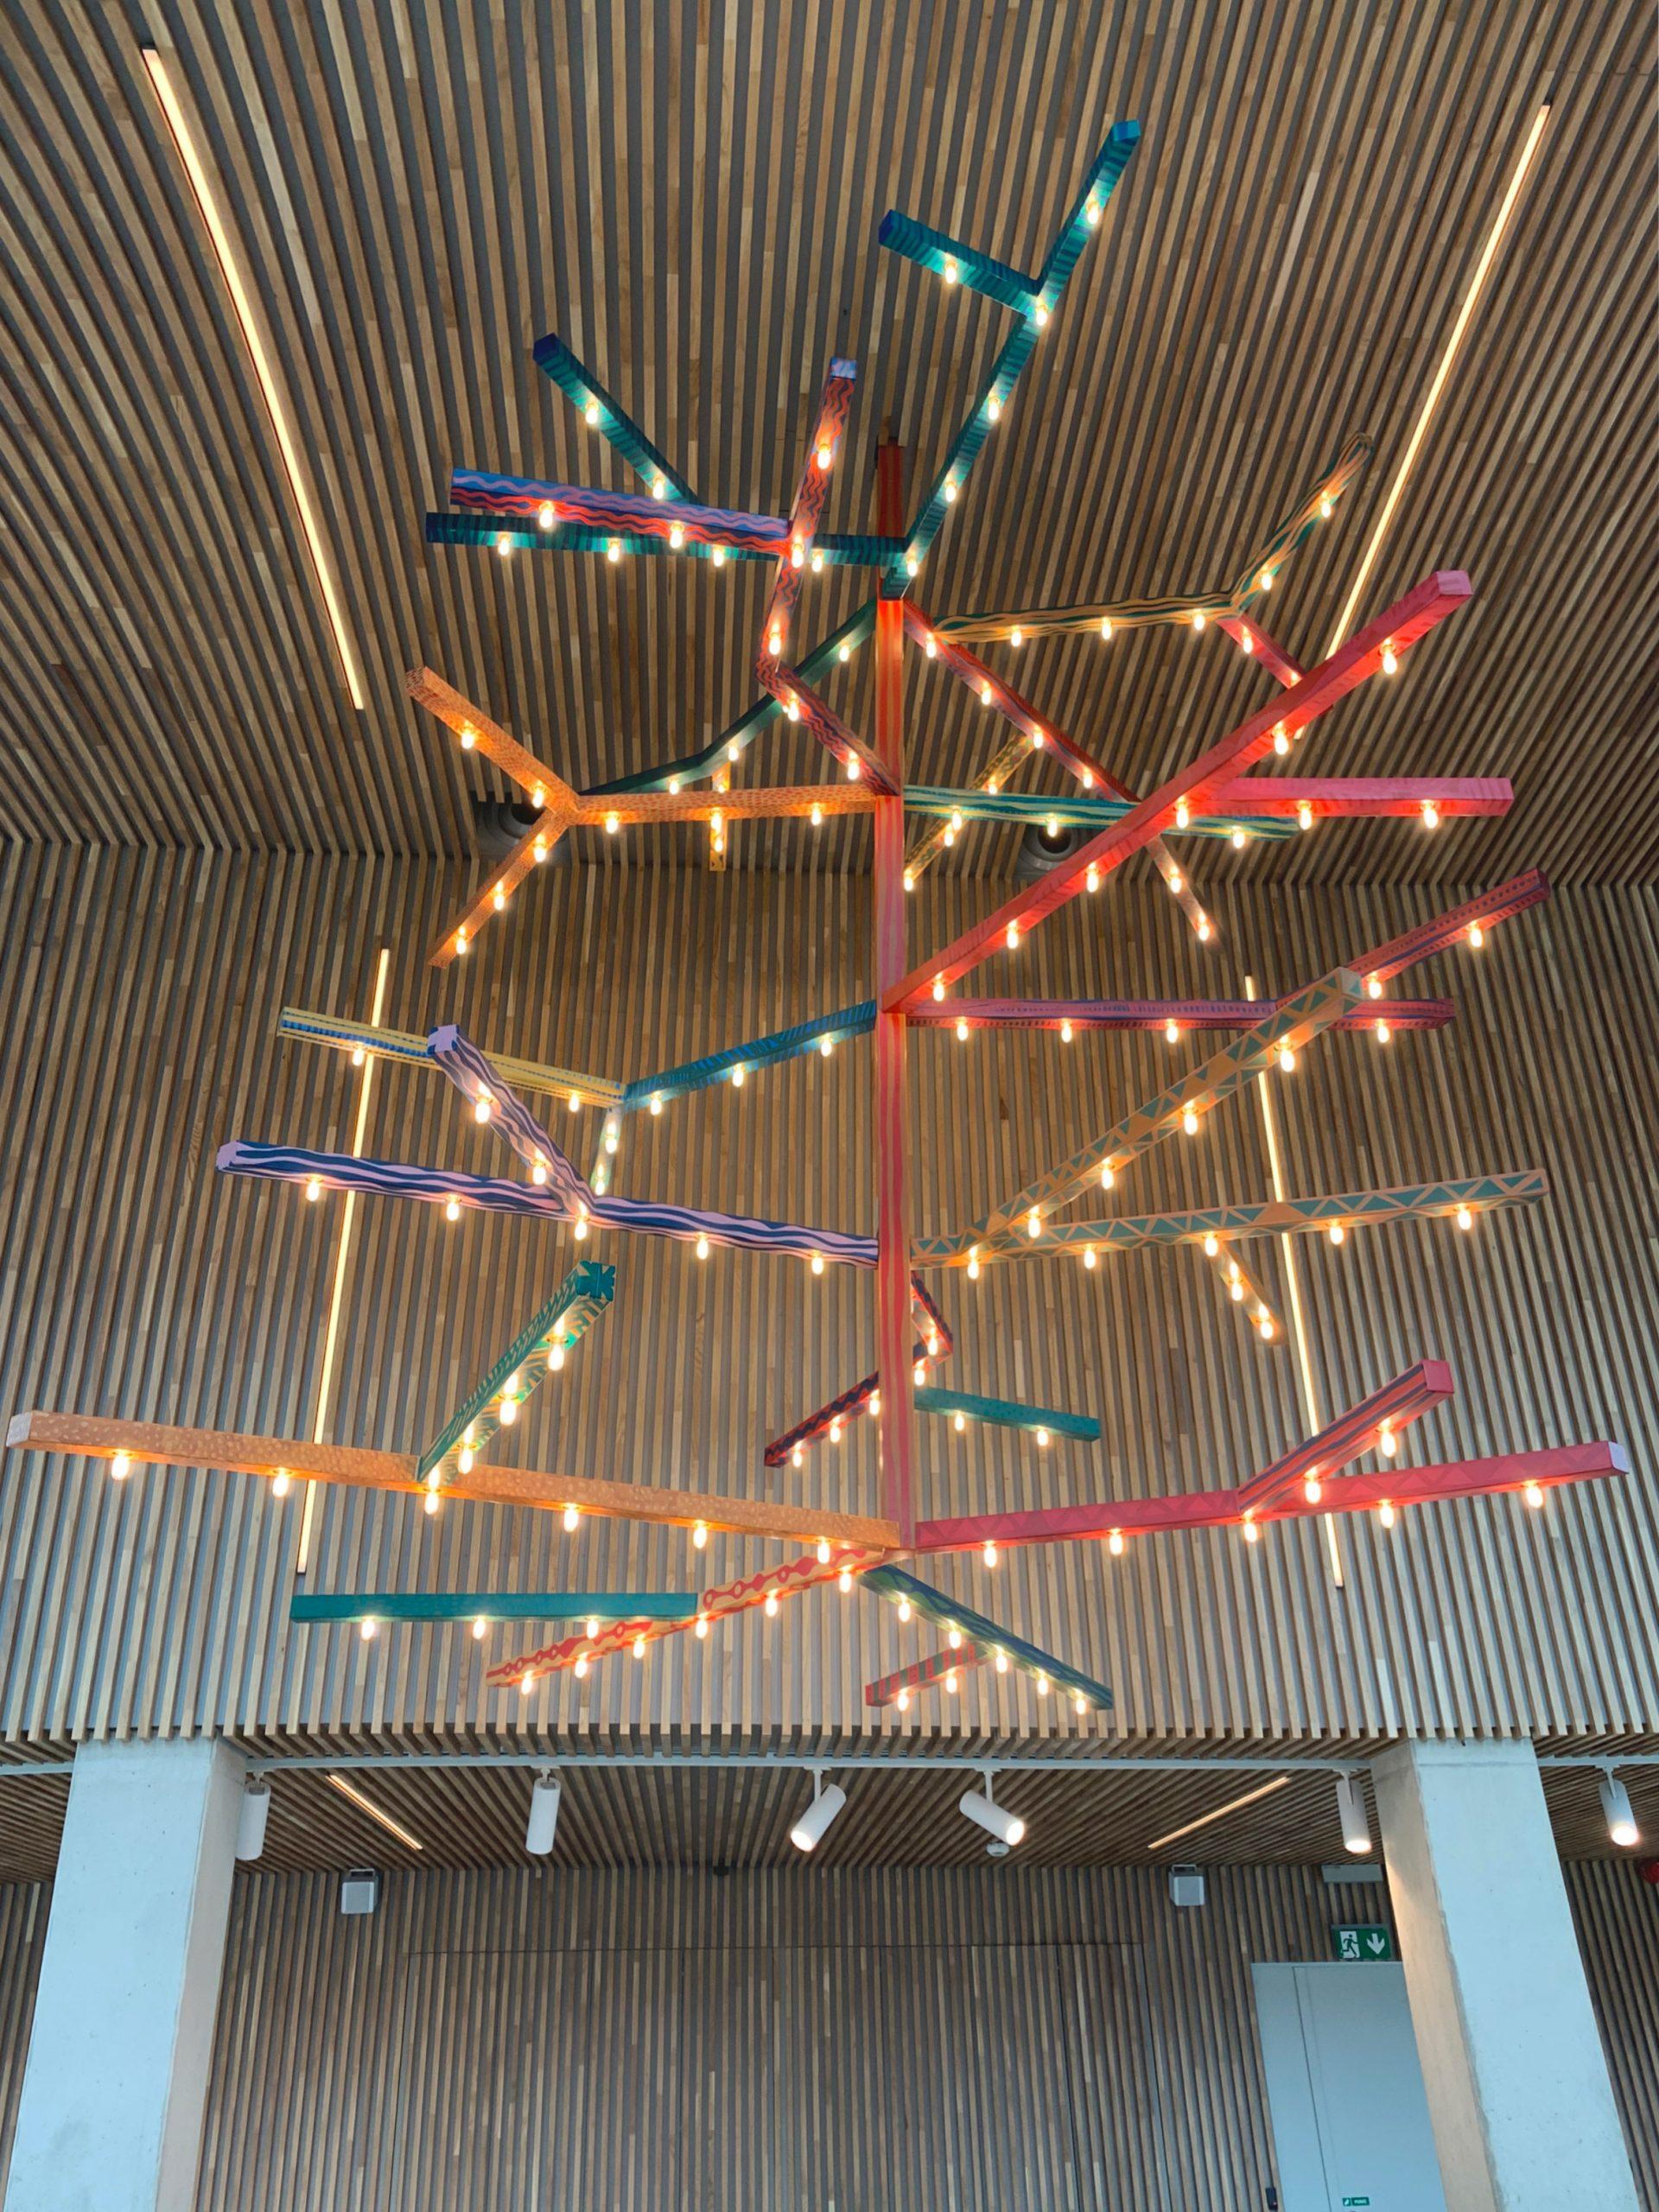 Lighting design at Concordia Design by MVRDV and Alicja Biala